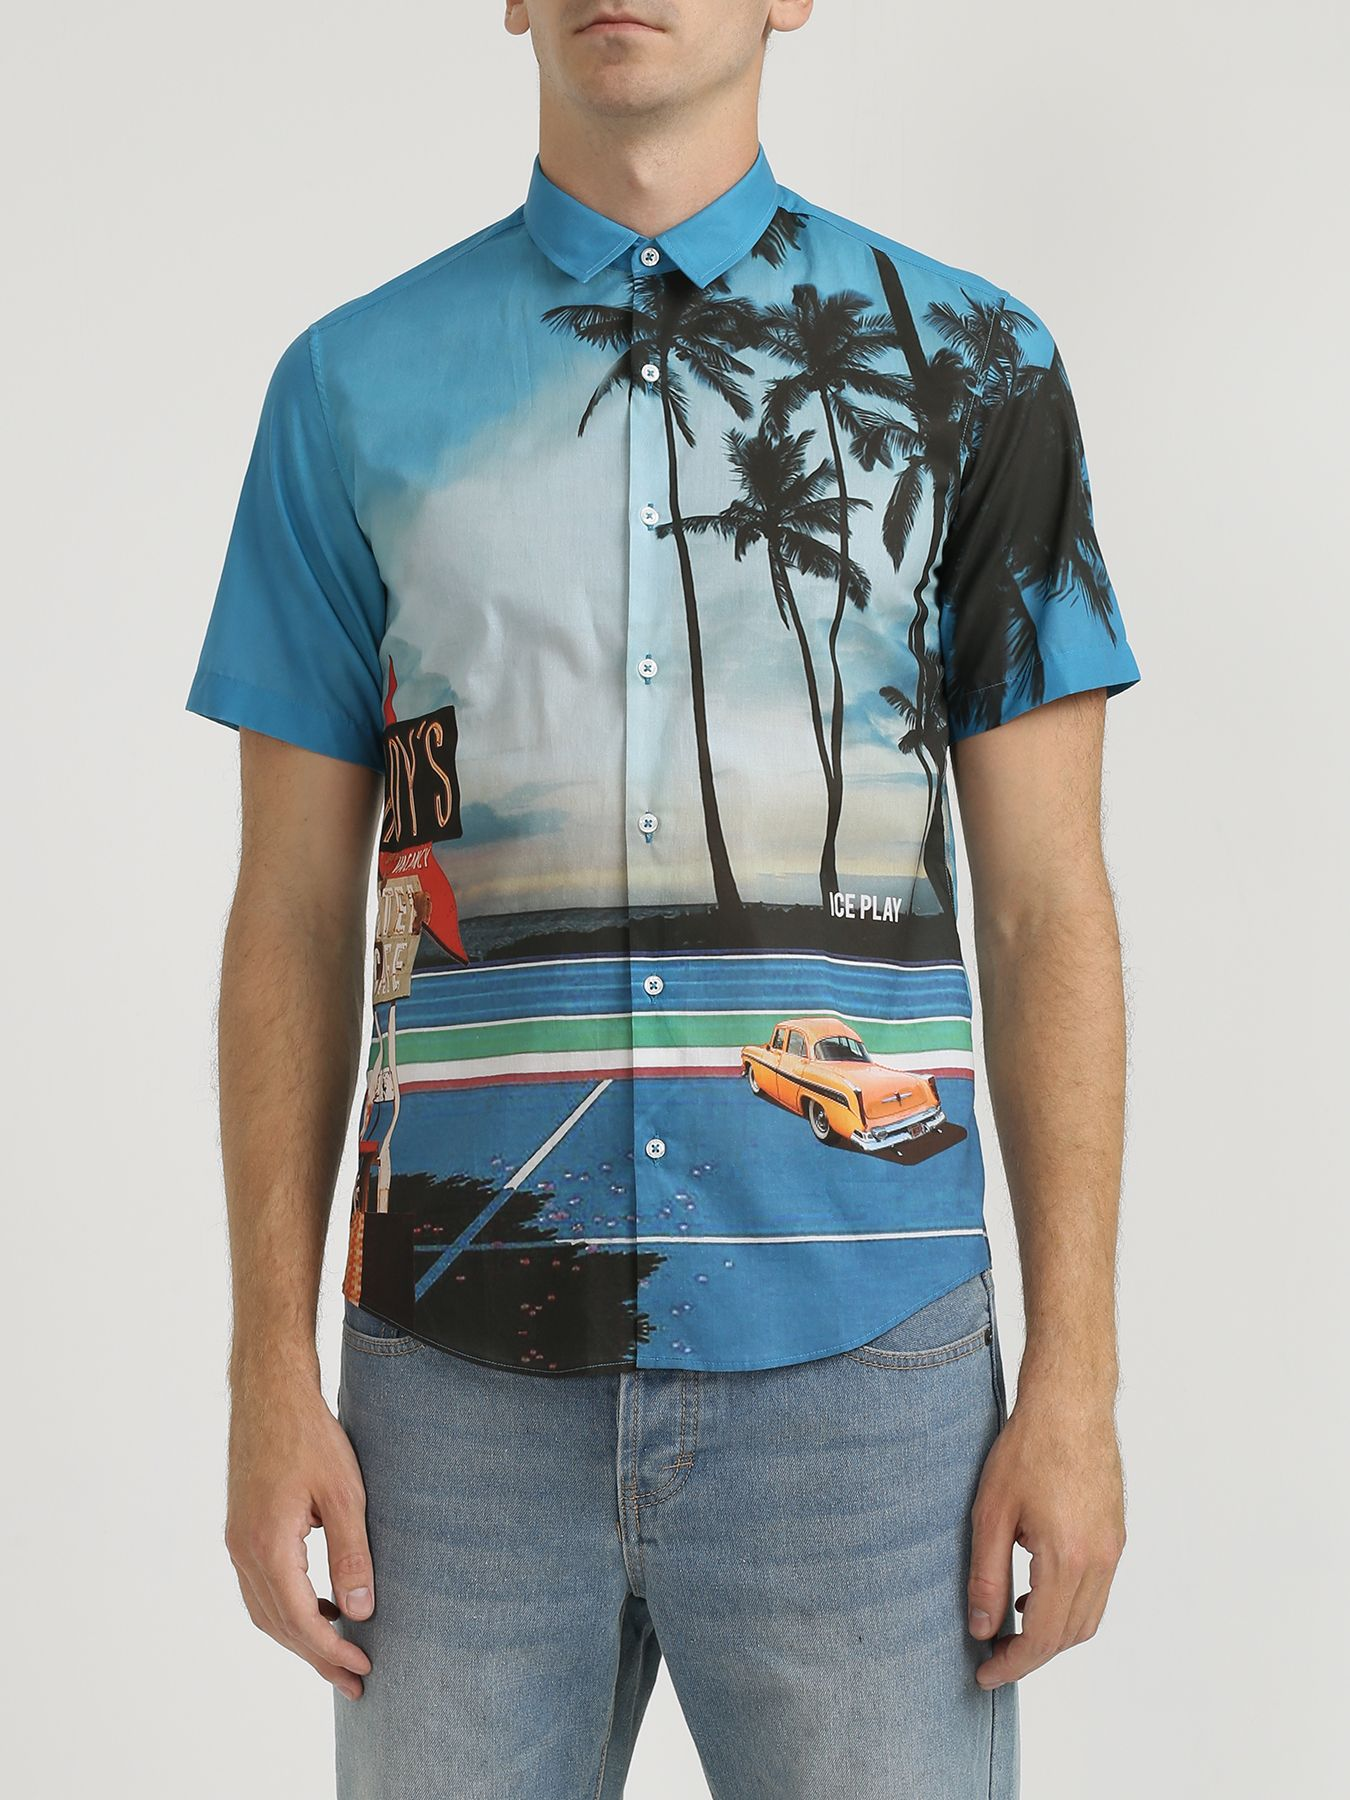 ночная рубашка с принтом в полоску Рубашки Ice Play Рубашка с ярким принтом